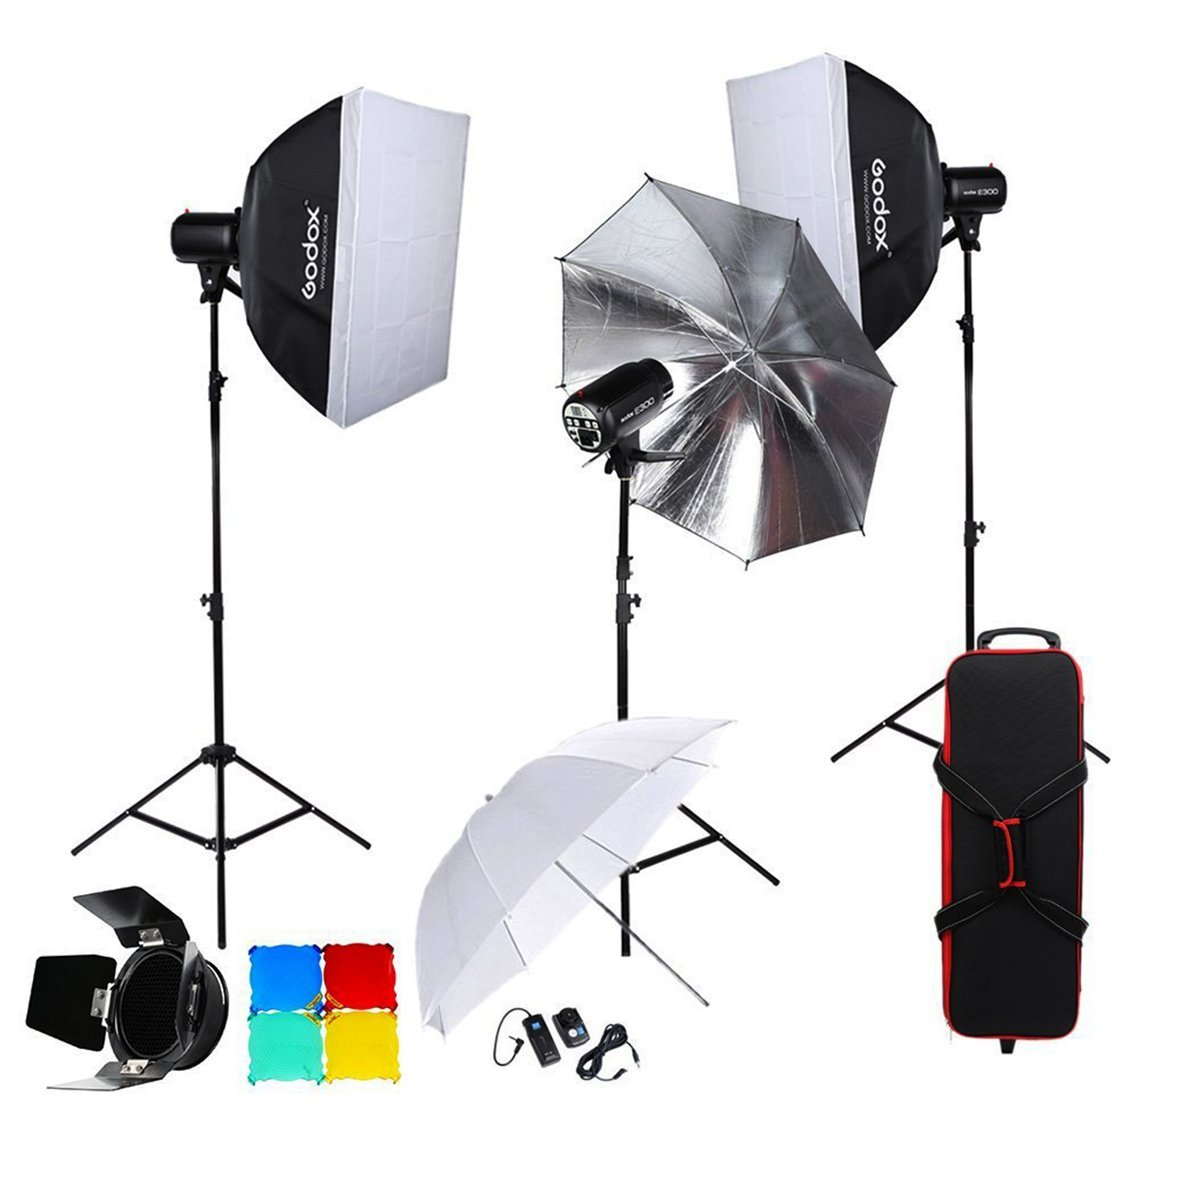 Godox E300 3300W 900W Studio Flash Light Kits with Portable Light Stand, Softbox, Reflector Umbrella, Barn Door Diffuser and RT-16 Wireless Flash Trigger Kits